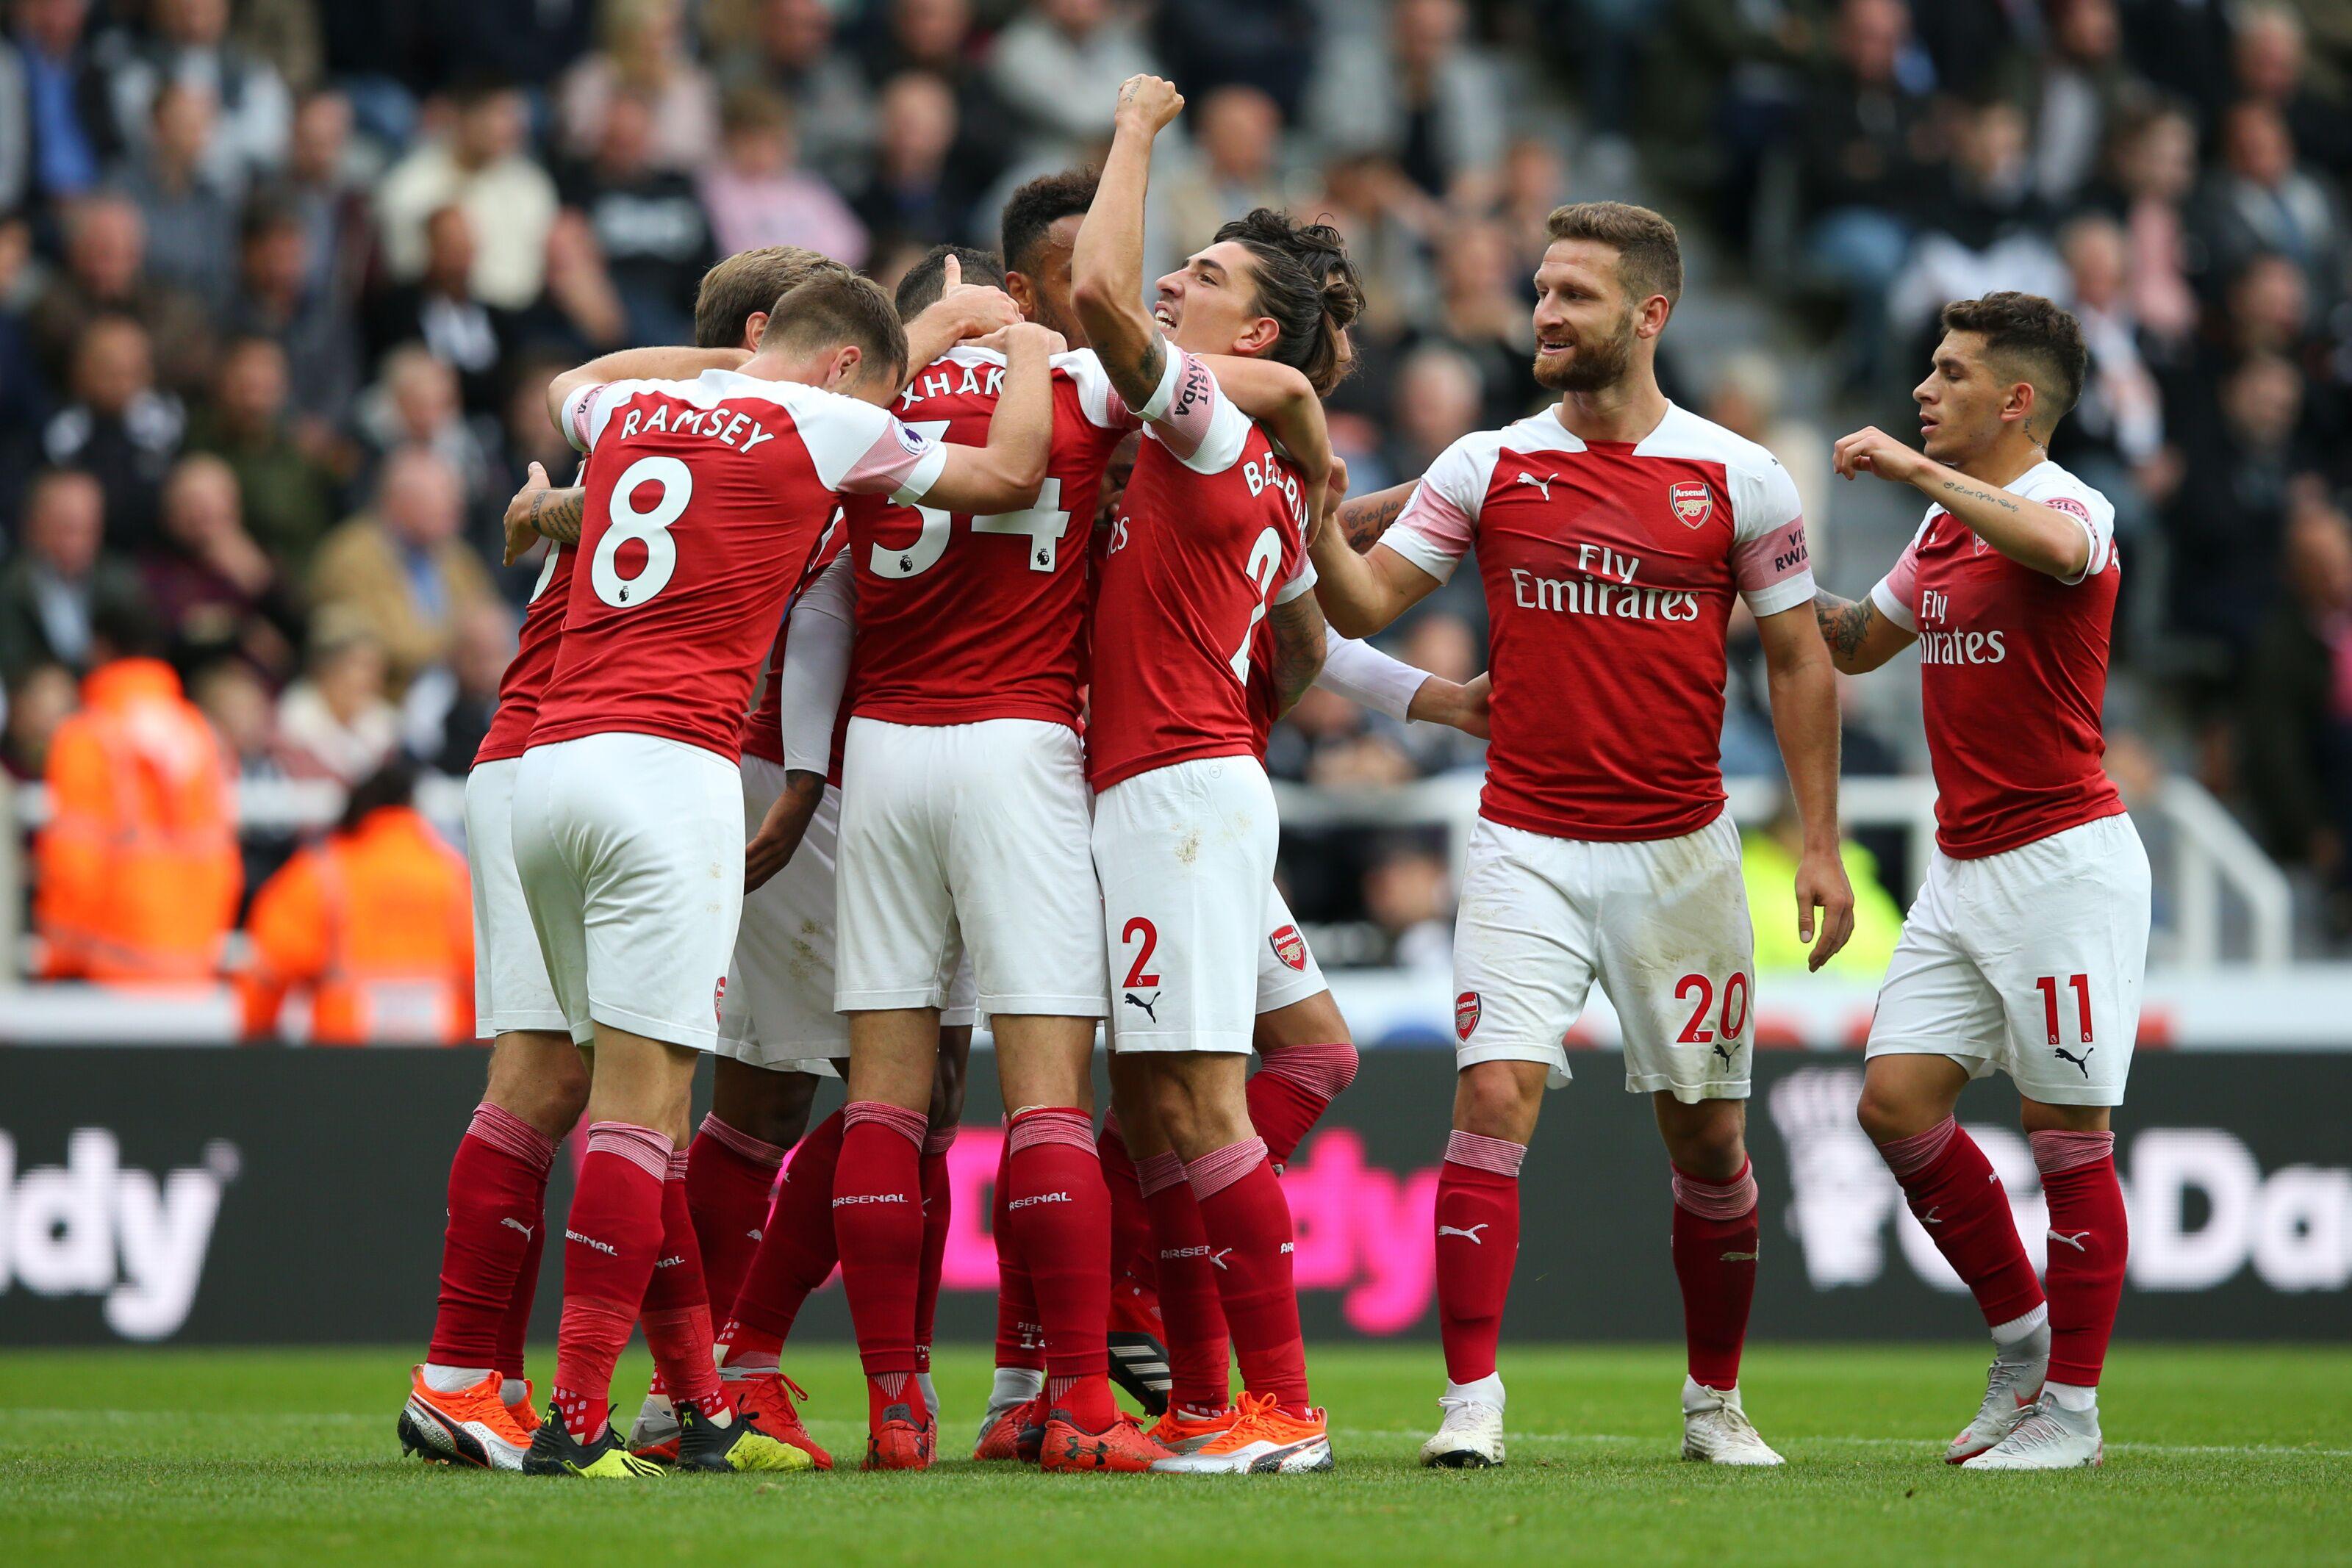 Arsenal Vs Newcastle United: 5 Things We Learned